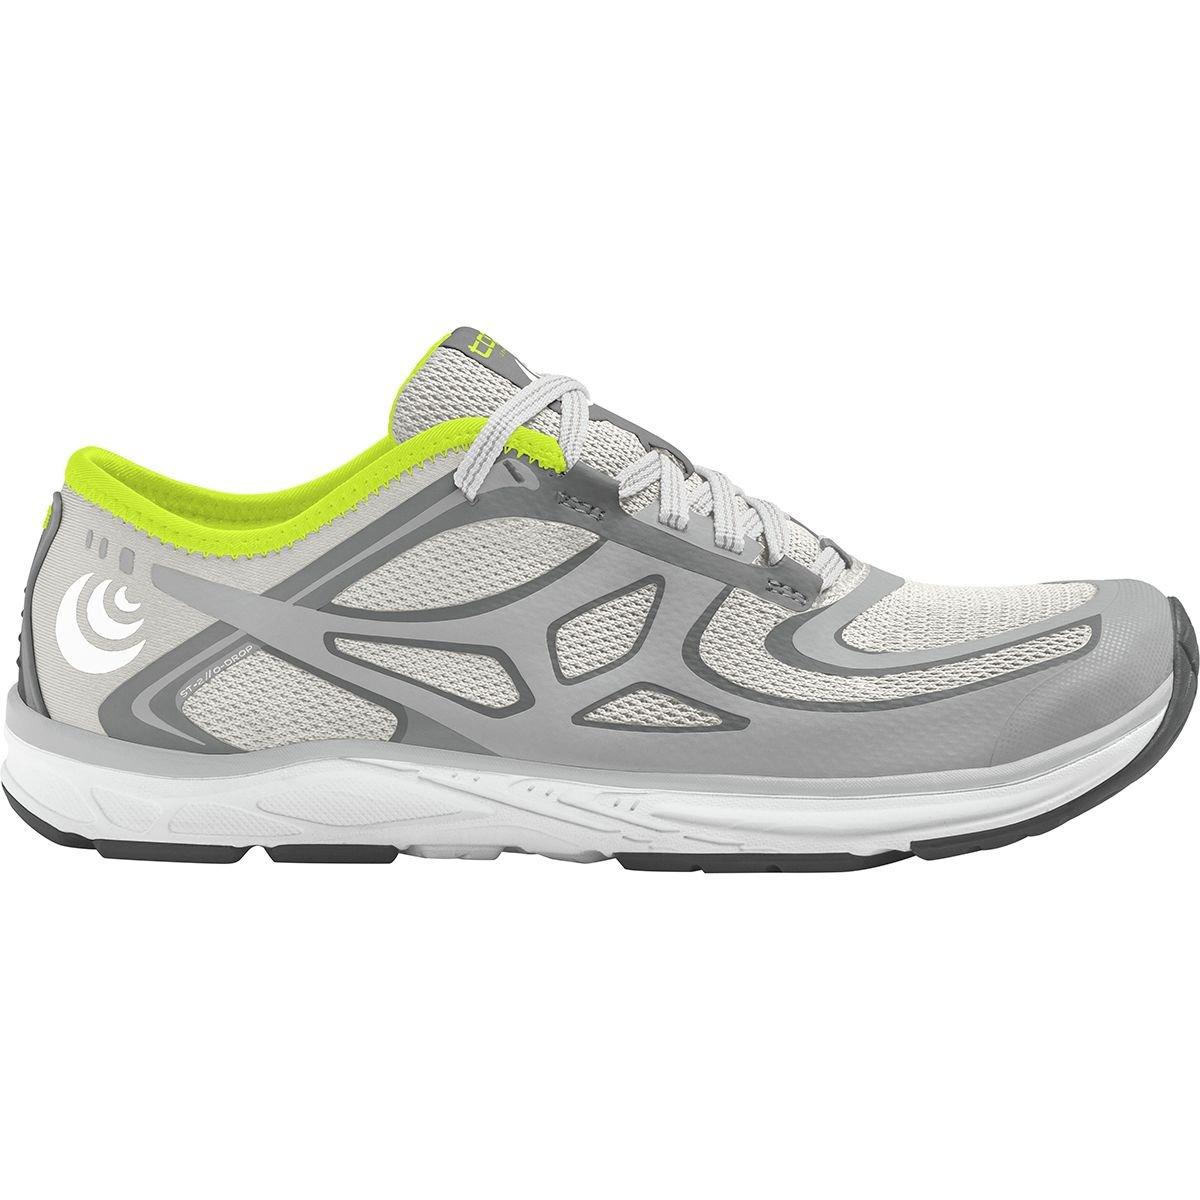 Topo Athletic Women's ST-2 Running Shoe B071Z39SX3 8.5 B(M) US|Grey/Green